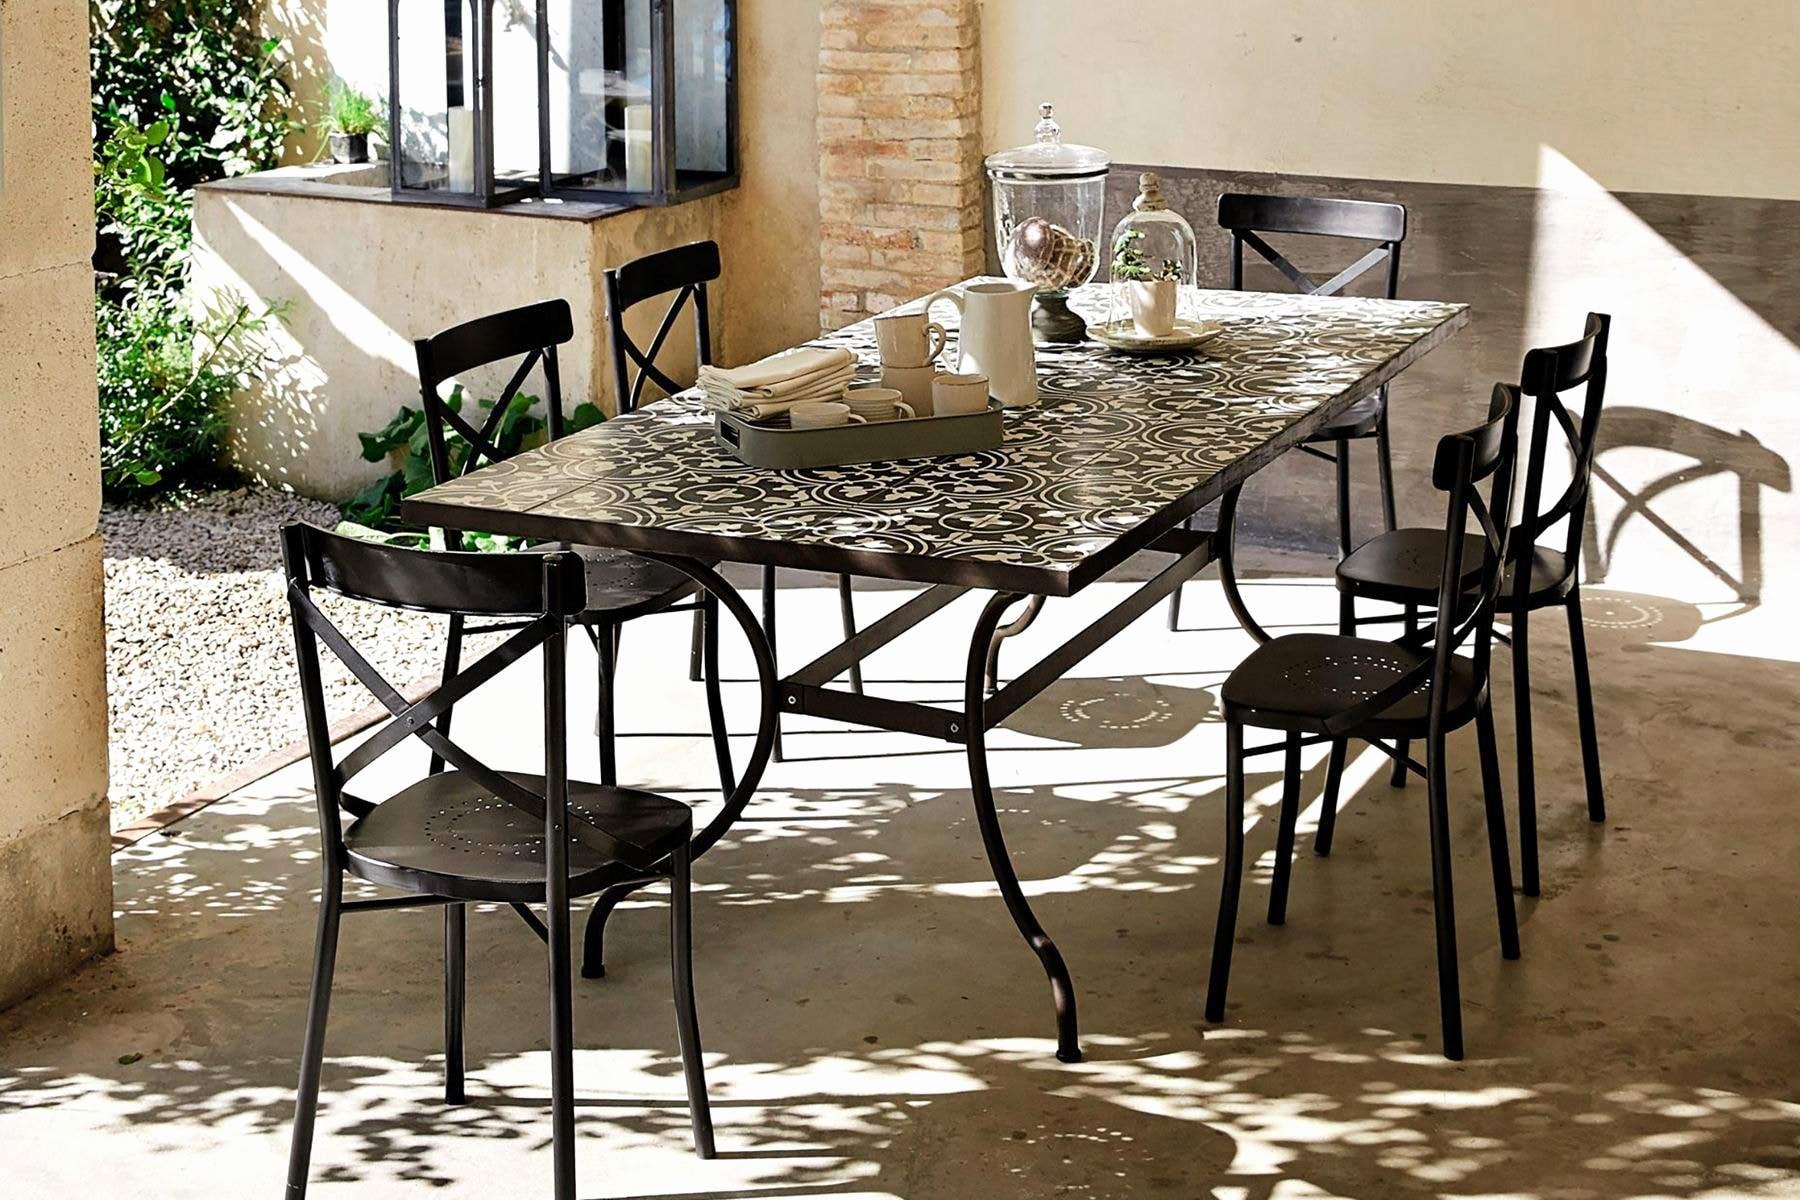 Table Kettler solde Frais Photos 15 Impressionnant Salon De Jardin Kettler Galerie De Cuisine